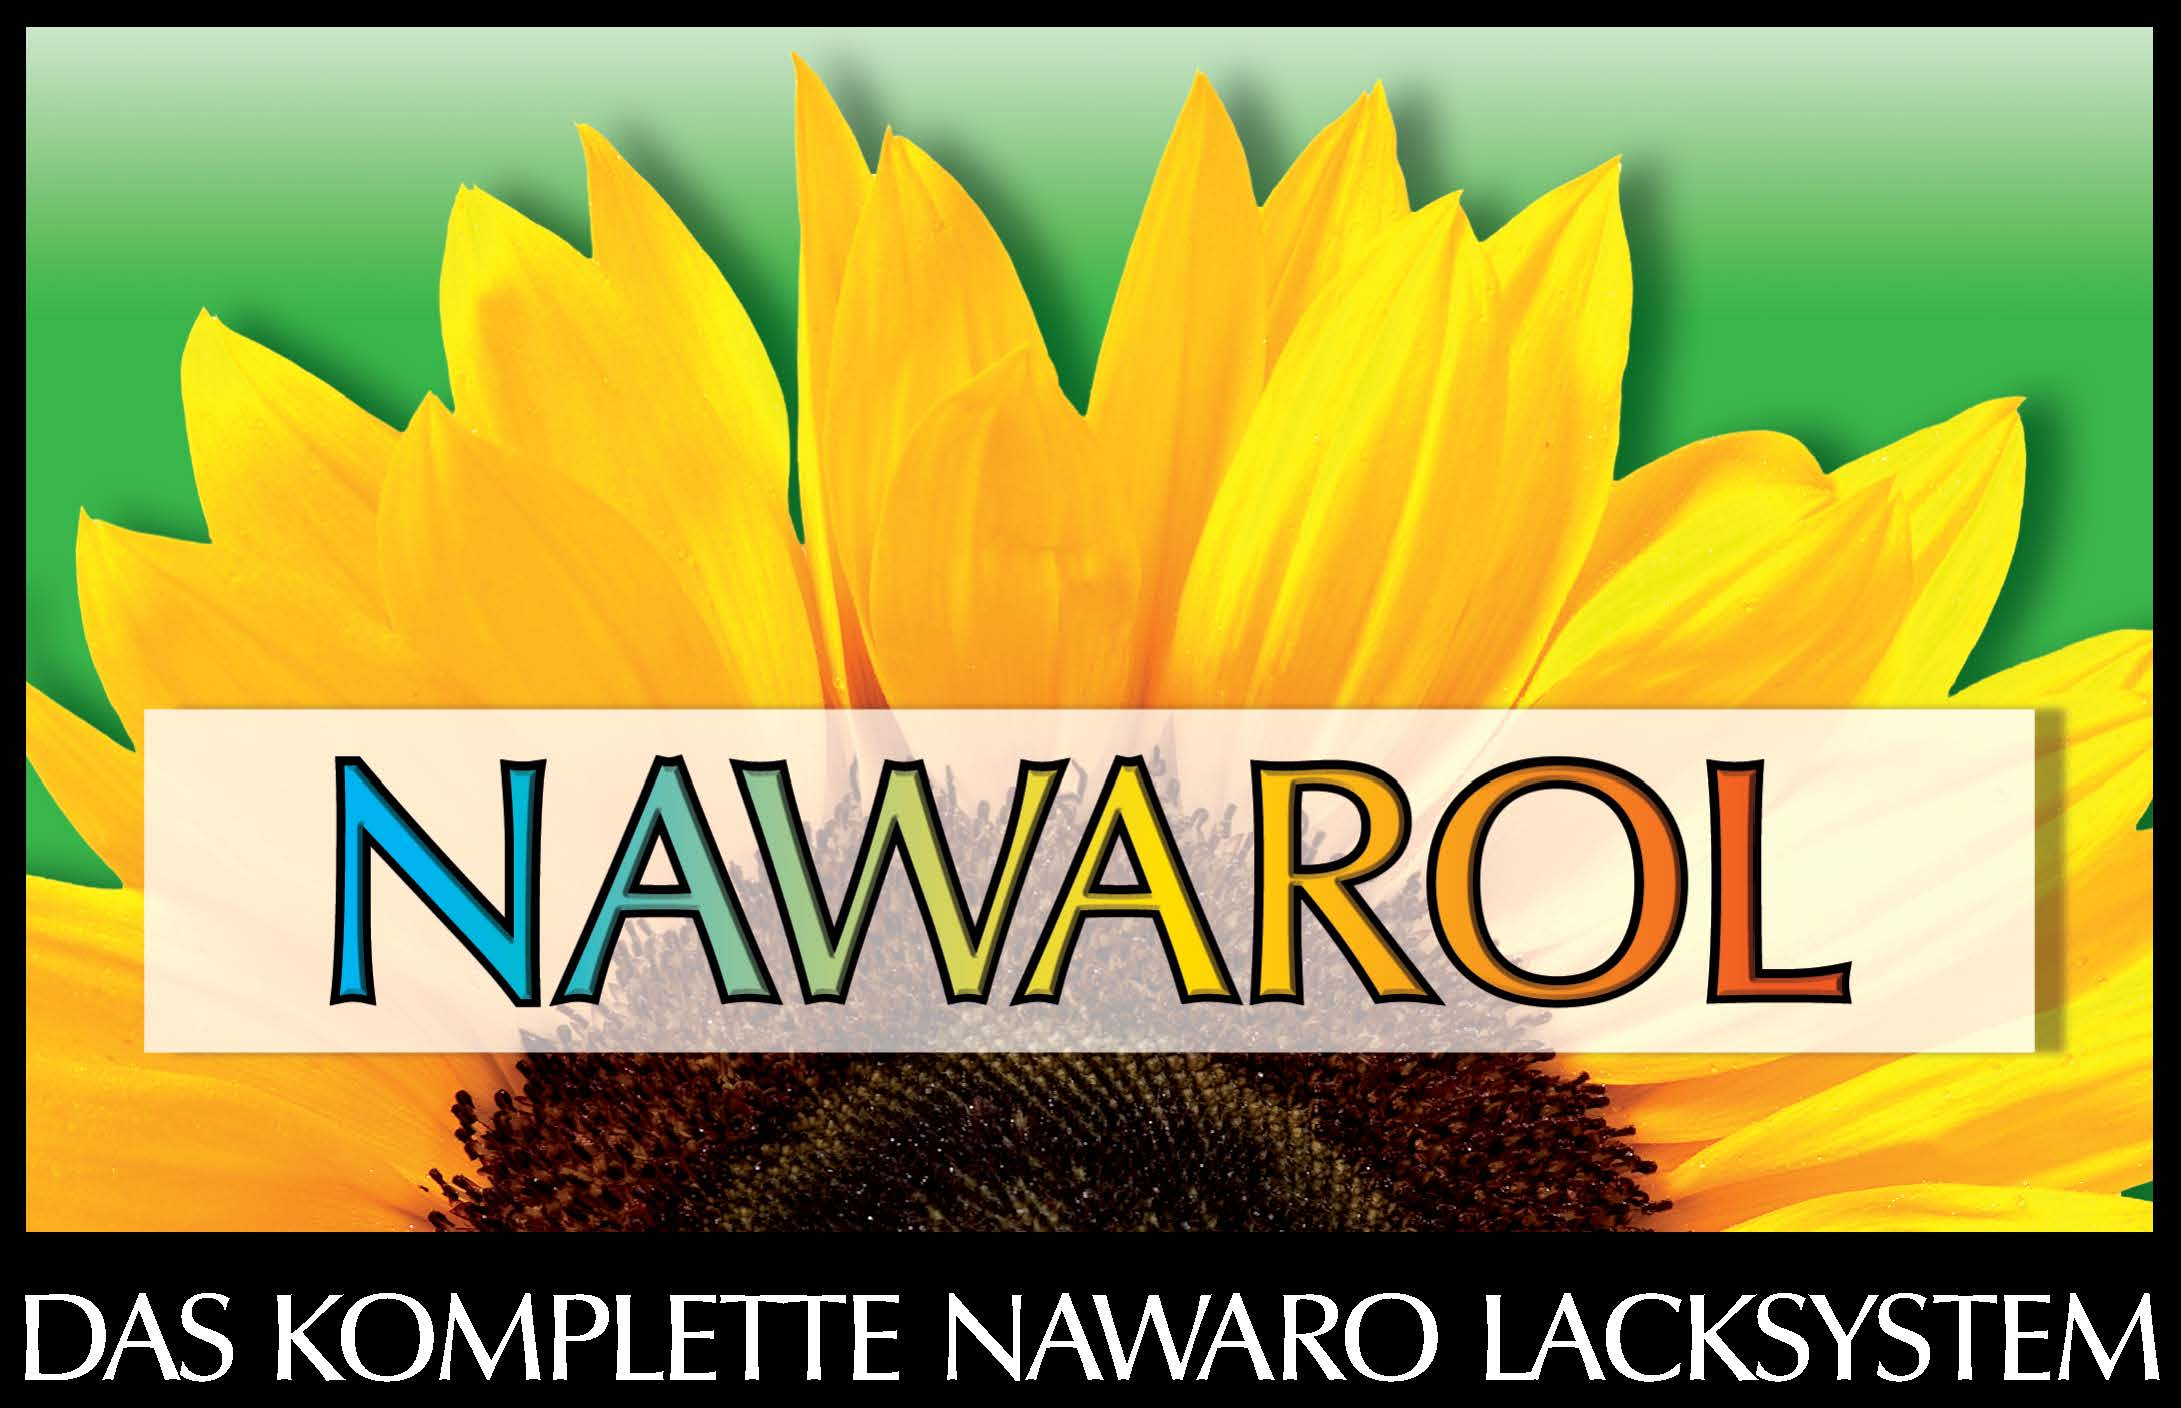 NAWAROL  -  Das komplette NawaRo Lacksystem